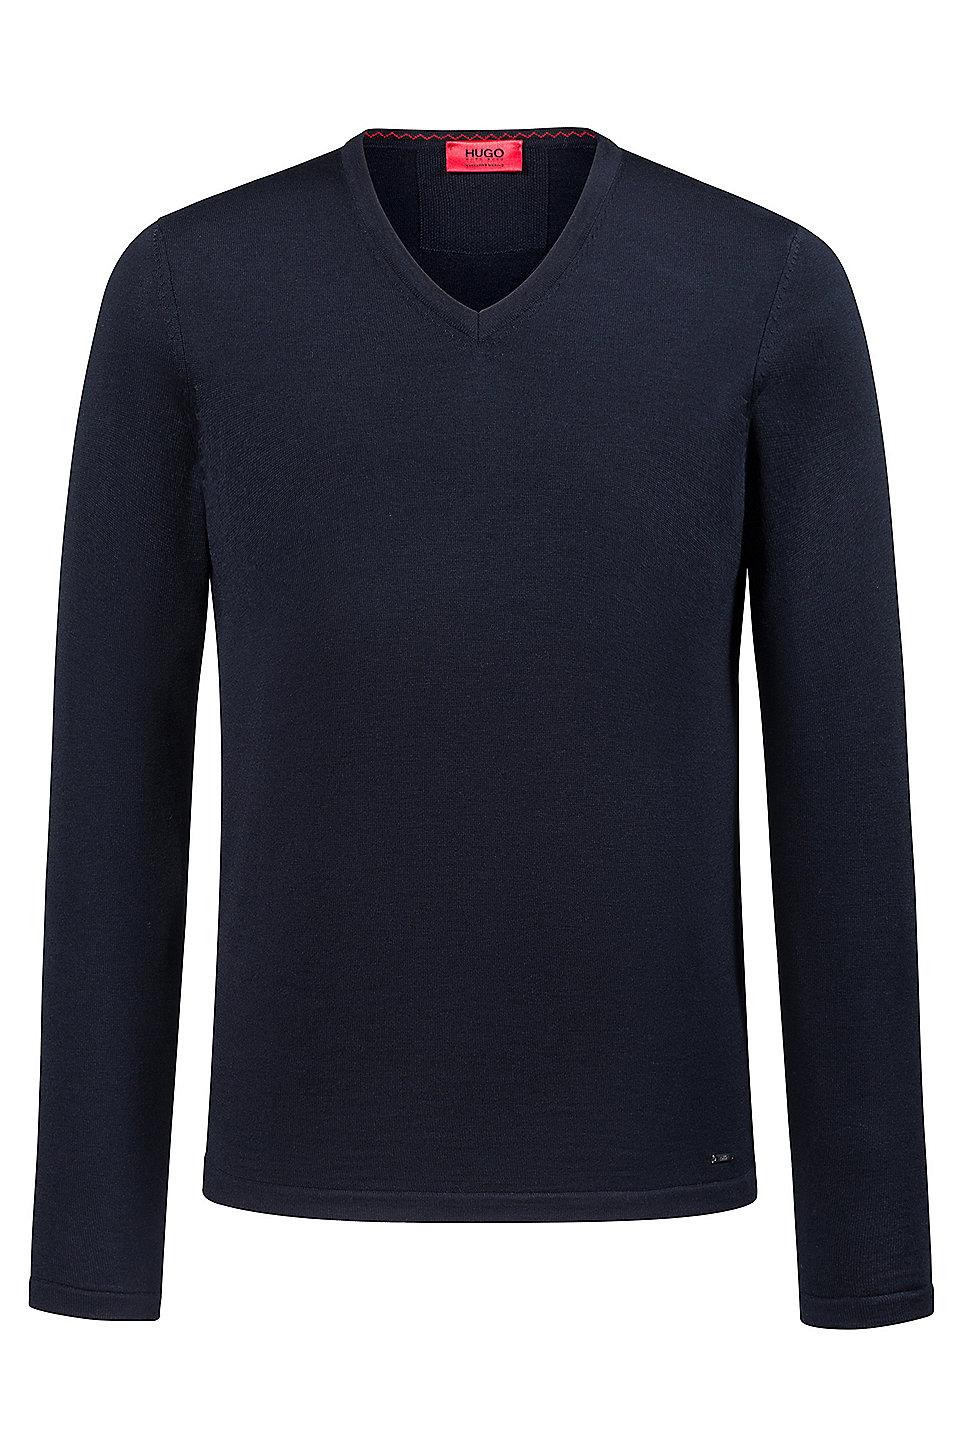 796dffc3a HUGO - Slim-fit V-neck sweater in Merino wool